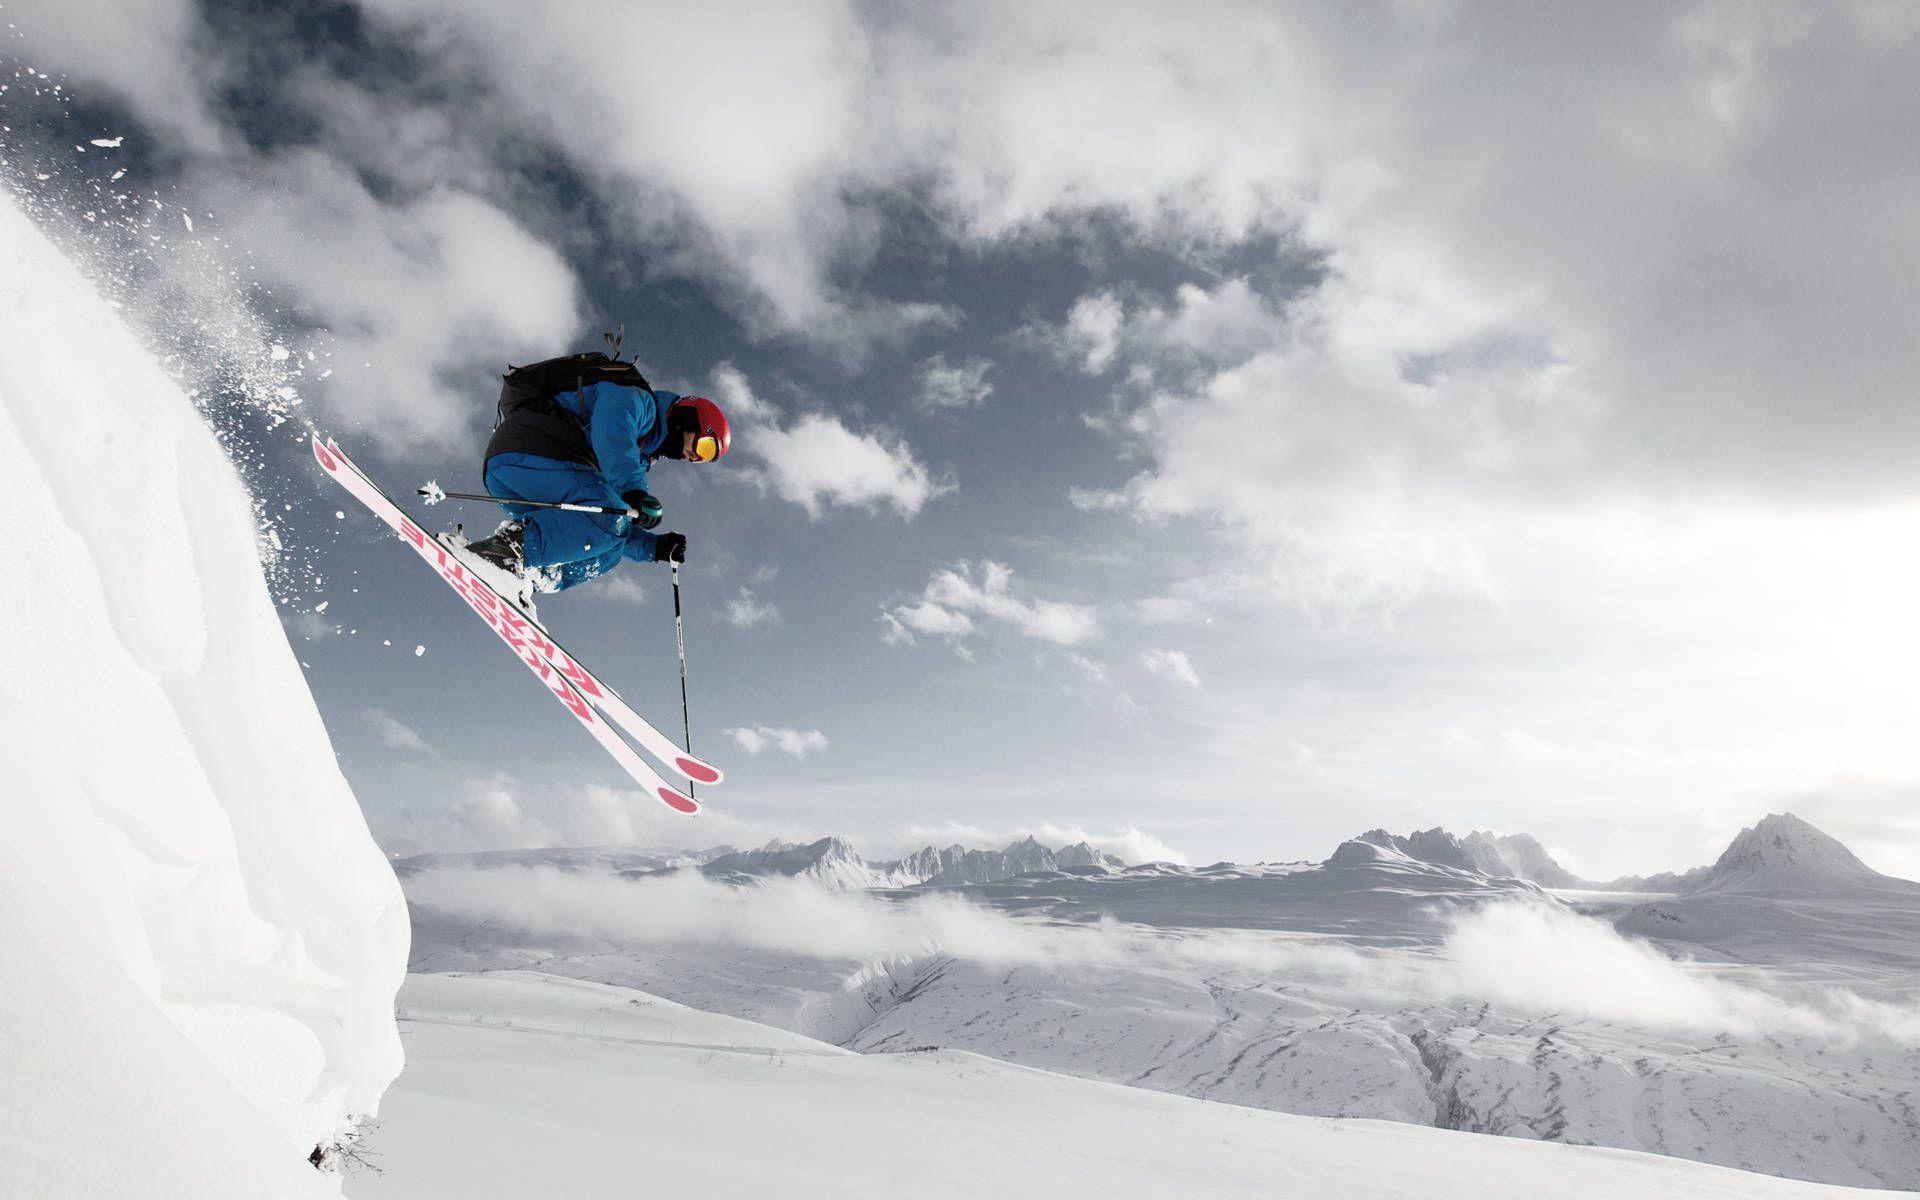 Kastle Bmx 98 Skis We Just Love Them Here At Chalet Ski